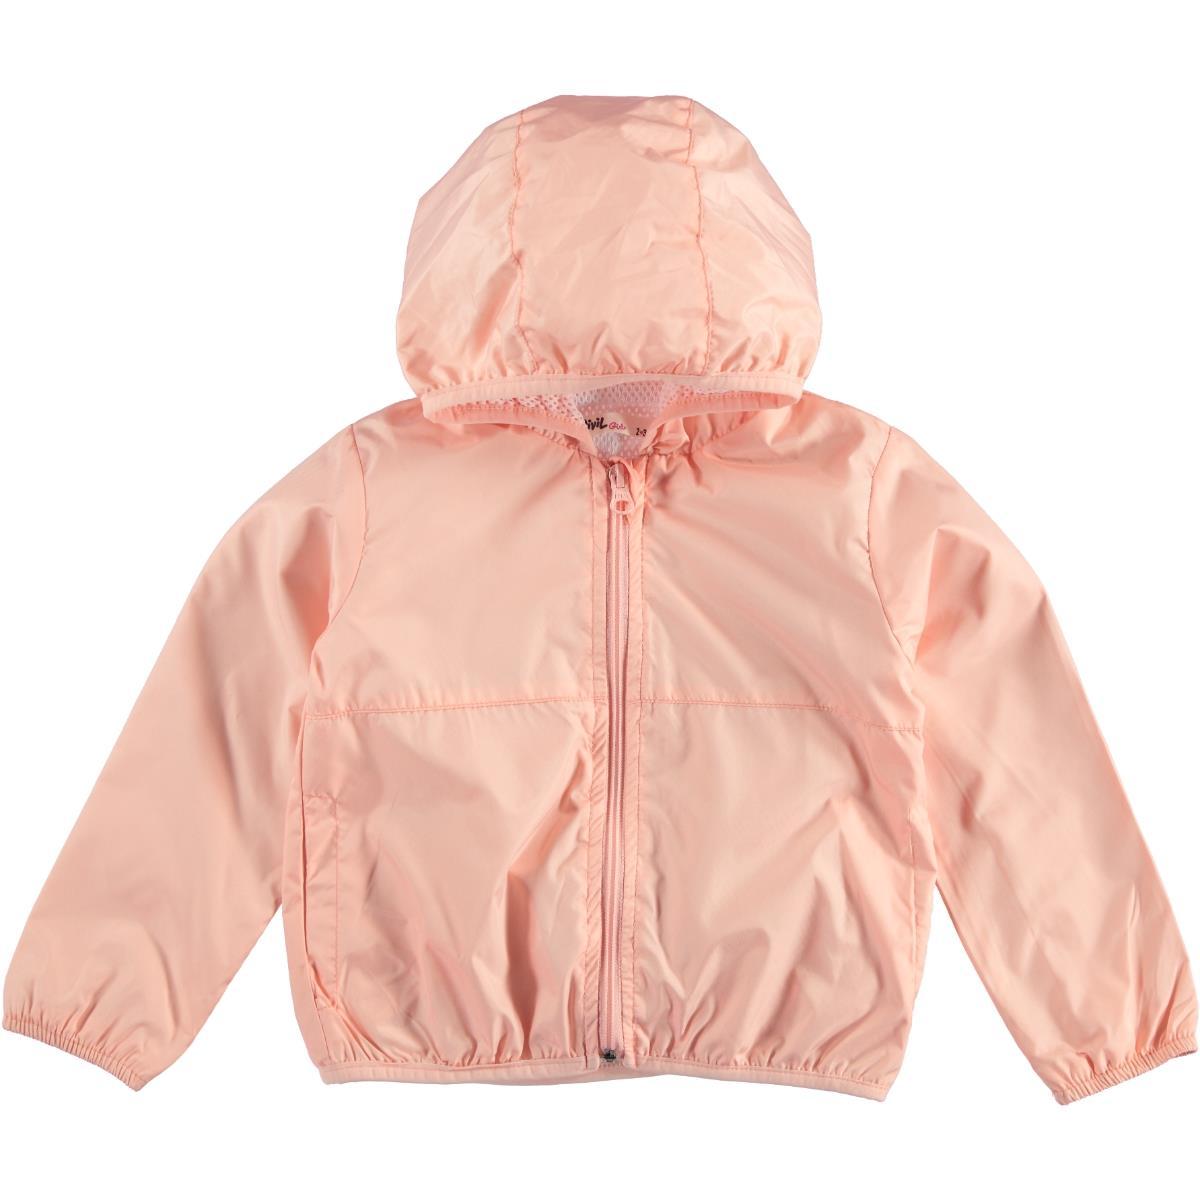 Civil Girls 2-5 Years Pink Girl Raincoat Hooded